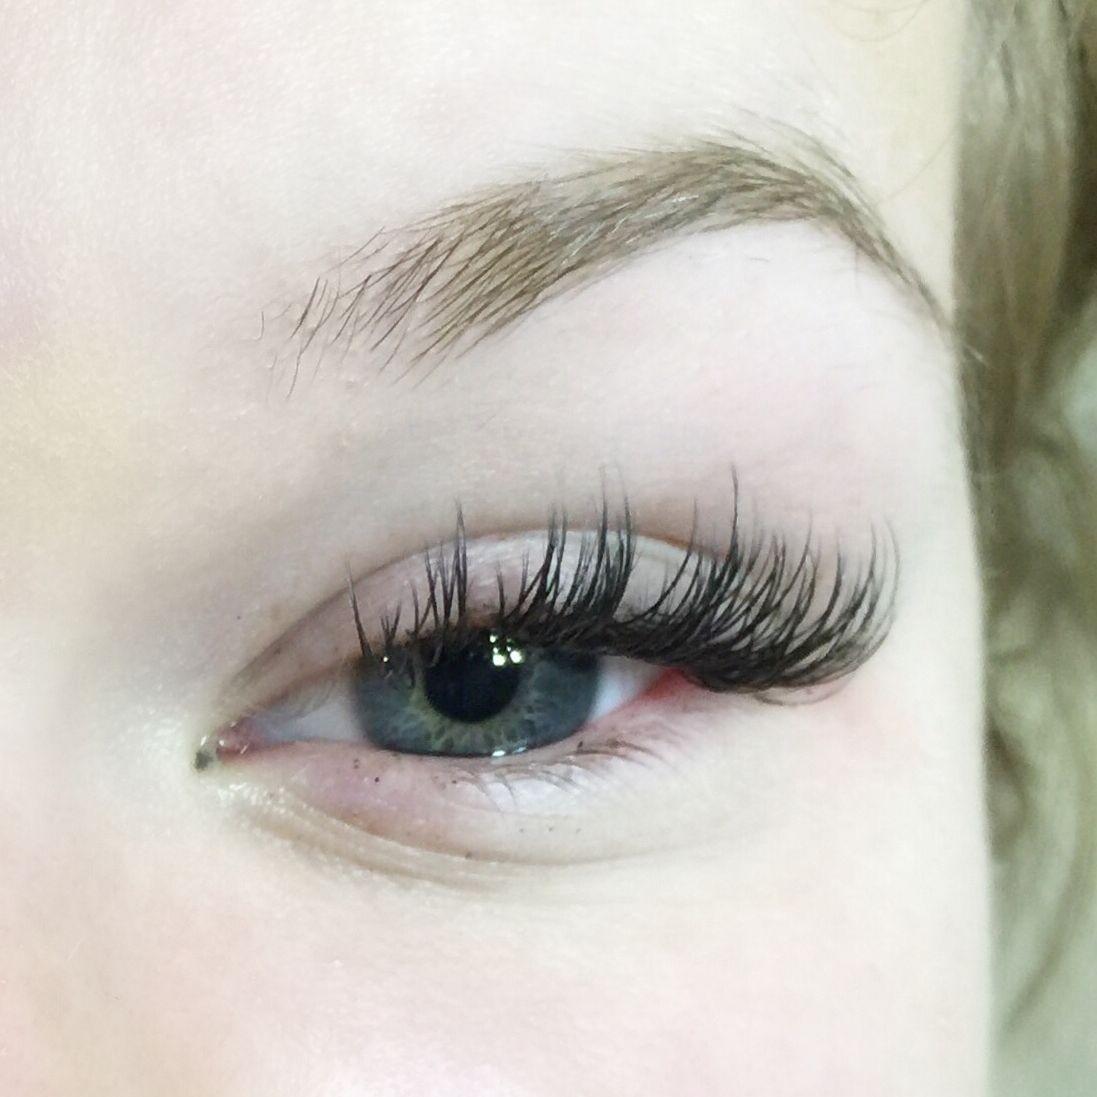 lash extensions, volume extensions, lashes, eyelash, classic, lakes lash studio, brainerd, minnesota, tessa elstran